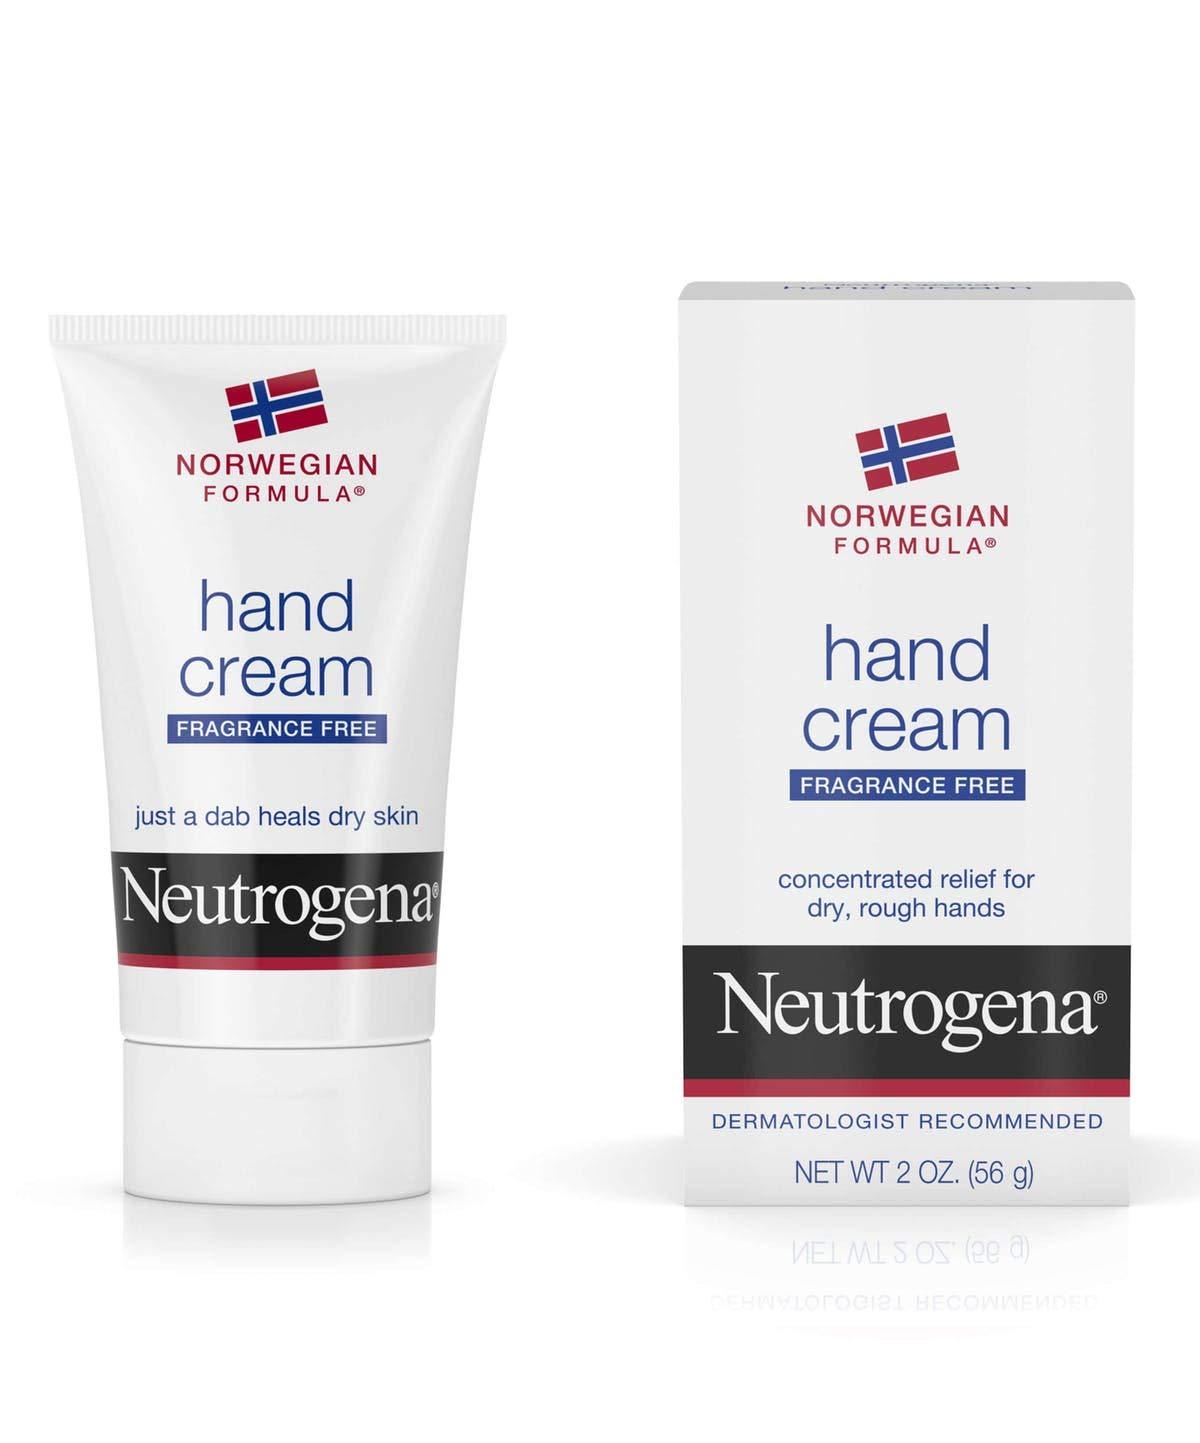 Neutrogena Norwegian Formula Moisturizing Hand Cream Formulated with Glycerin for Dry, Rough Hands, Fragrance-Free Intensive Hand Cream, 2 oz (Pack of 3) by Neutrogena